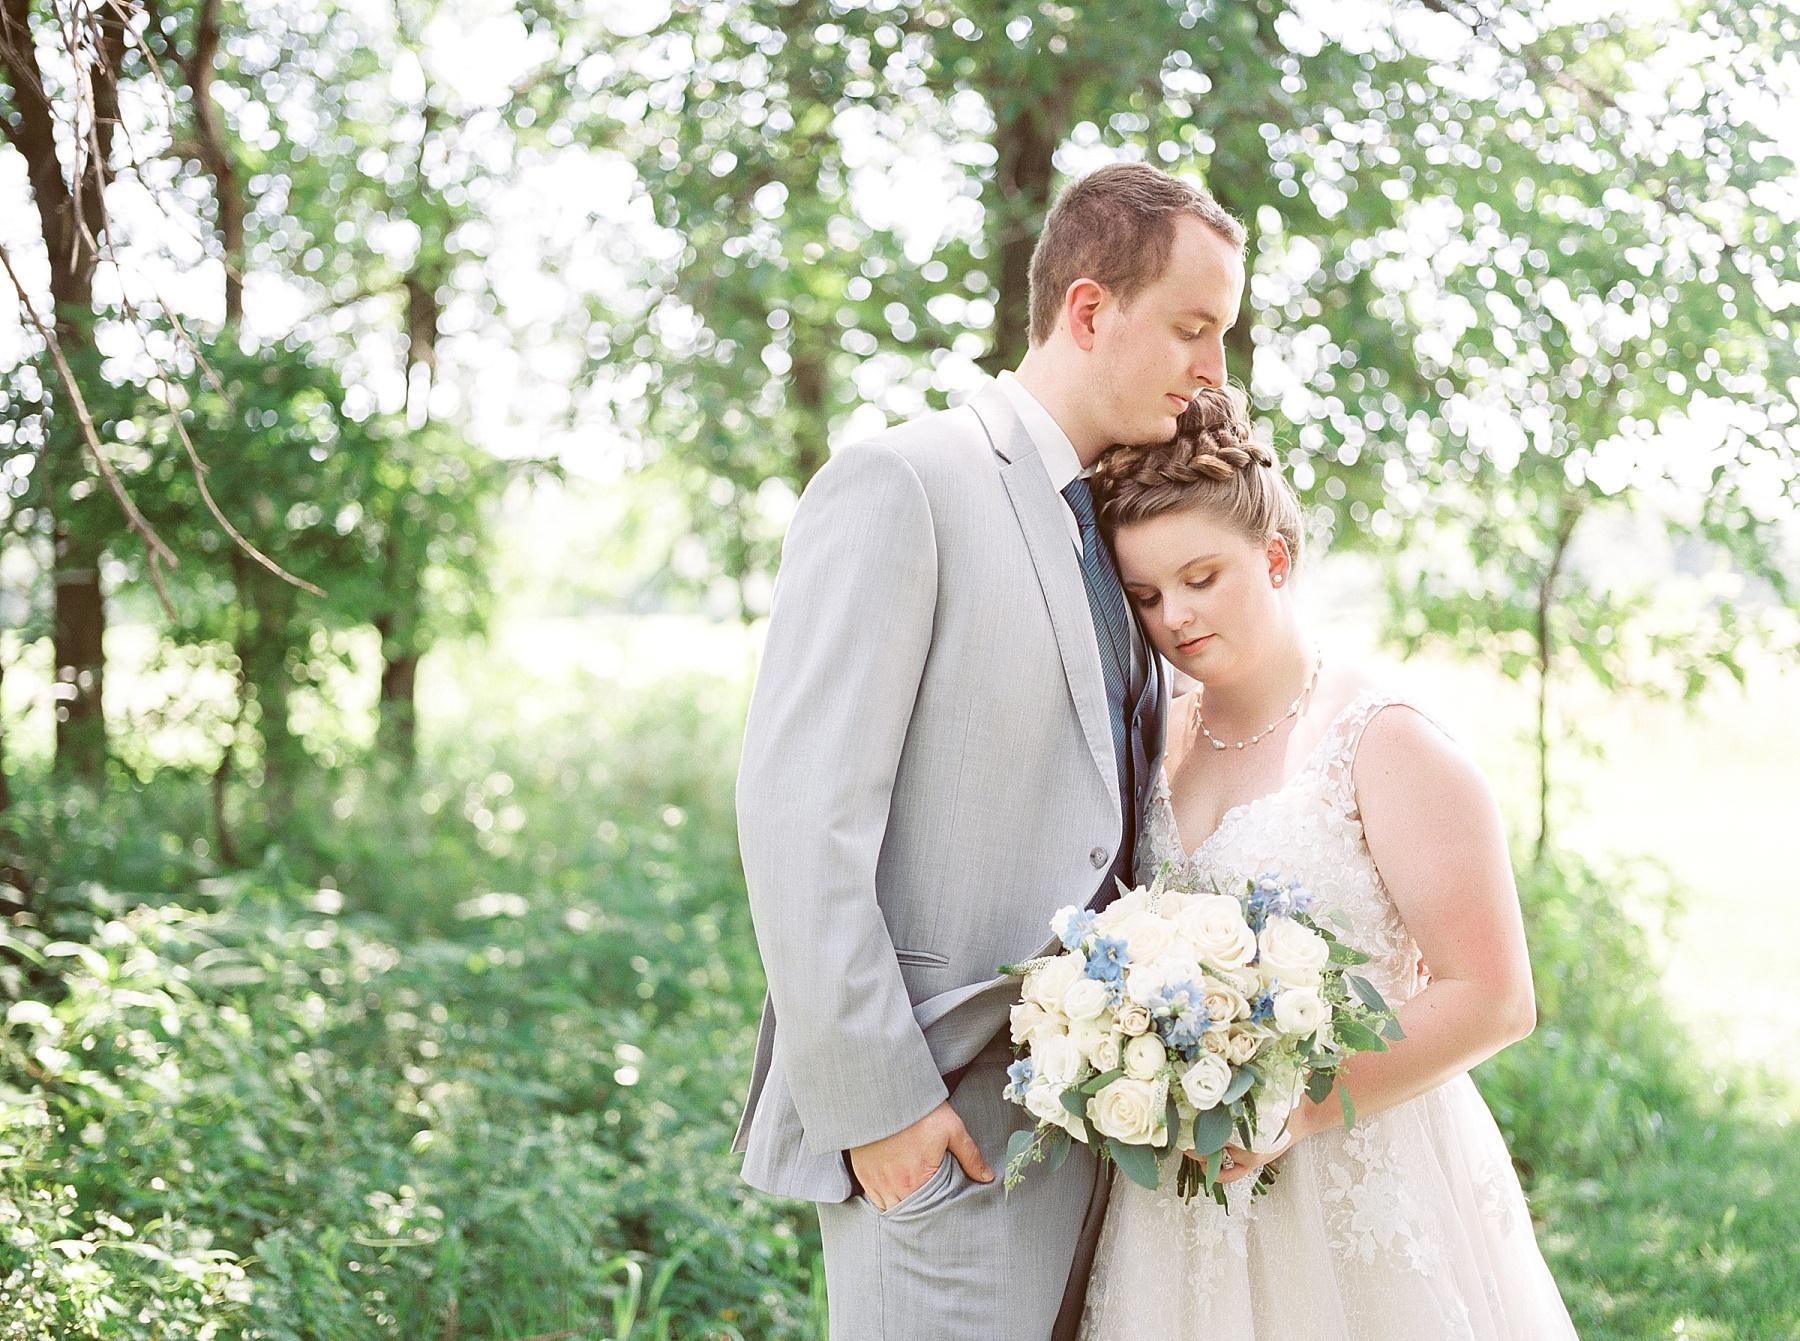 Intimate Summer Wedding at Emerson Fields by Kelsi Kliethermes Photography Best Missouri and Maui Wedding Photographer_0017.jpg